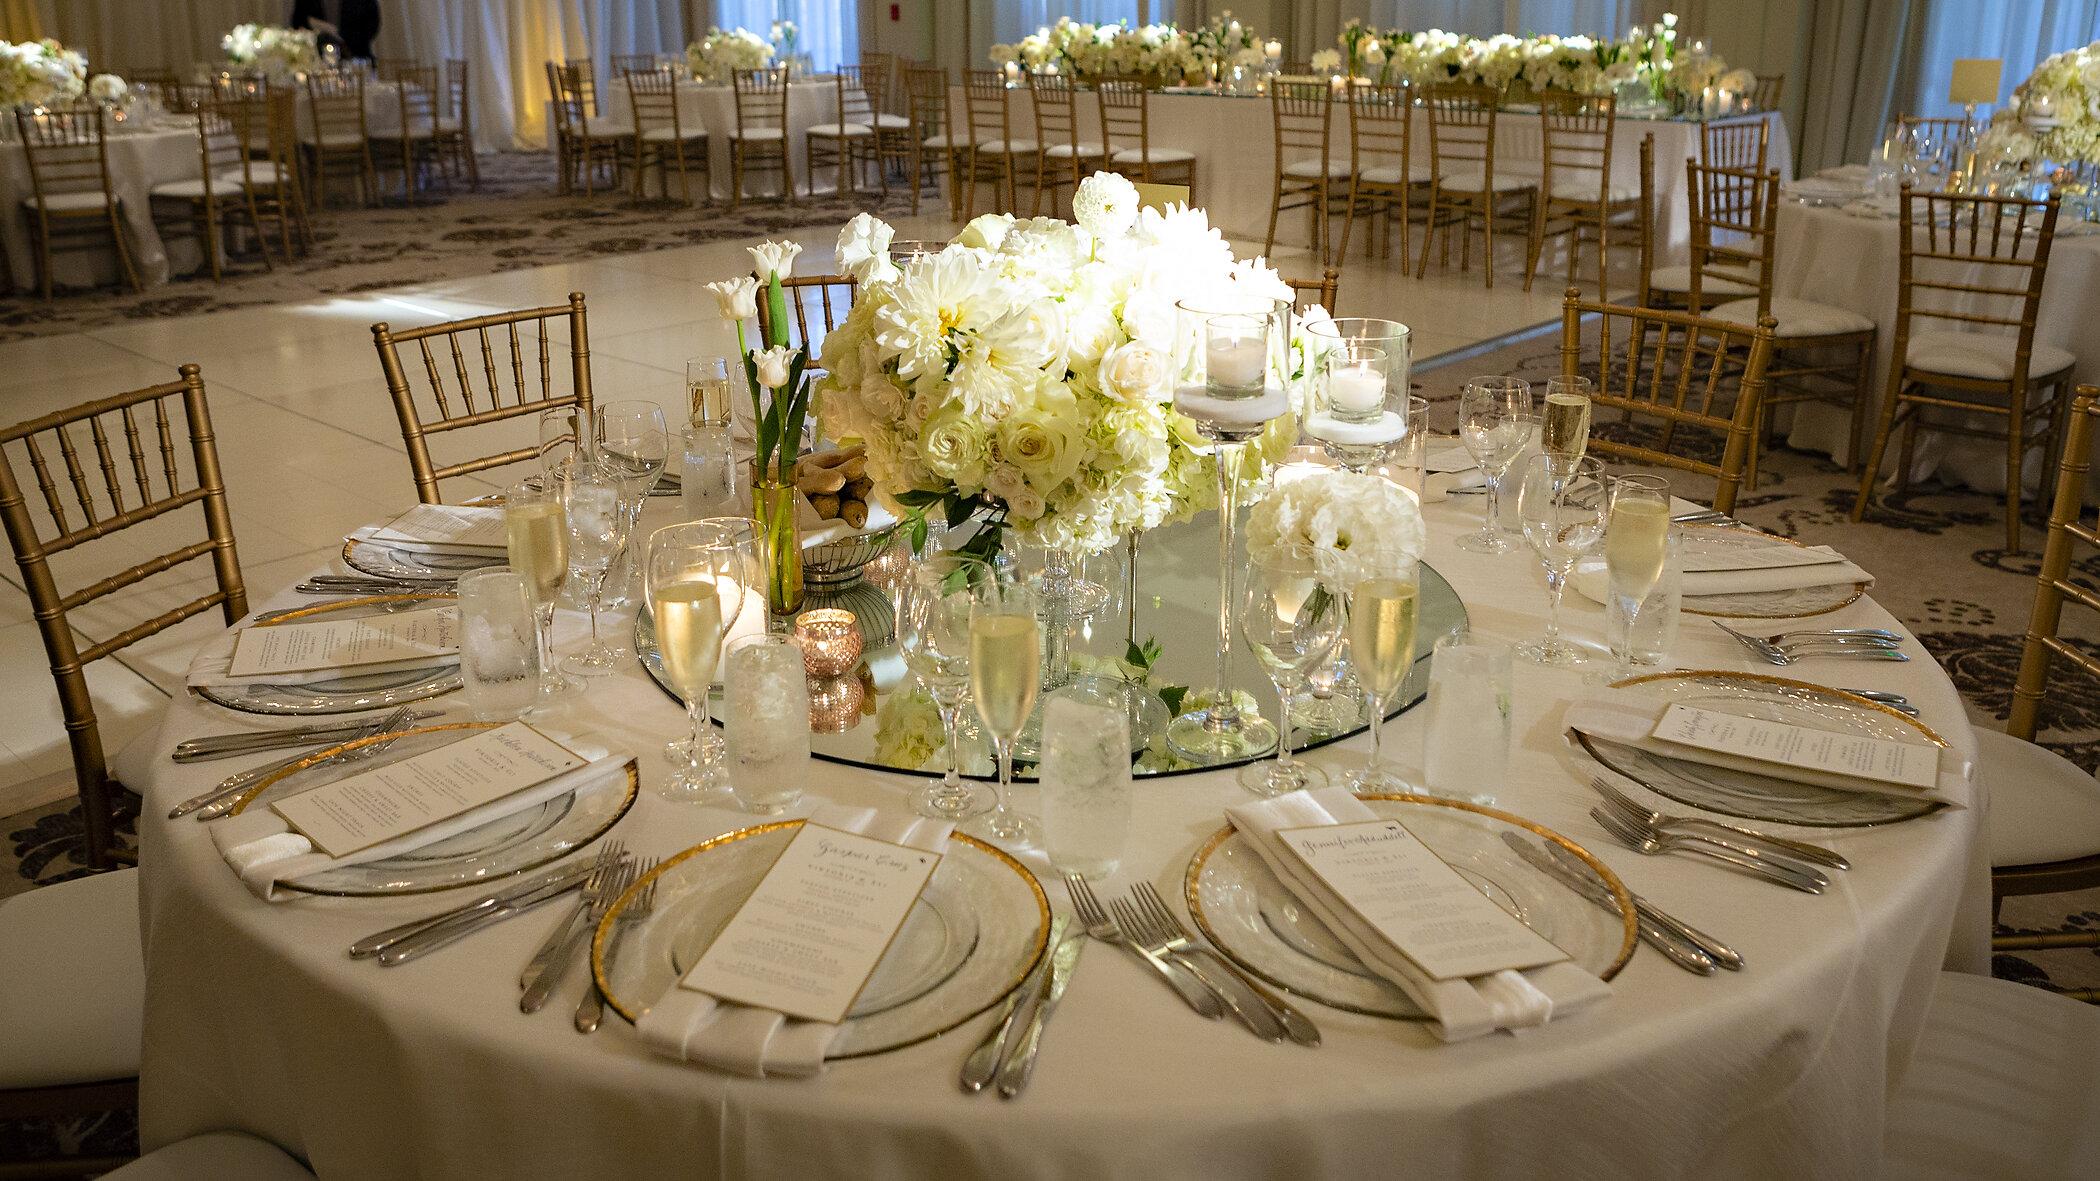 alegria-by-design-wedding-planner-planning-event-design-coordinator-day-of-belmond-el-encanto-lily-pond-garden-ceremony-formal-black-tie (11).jpg